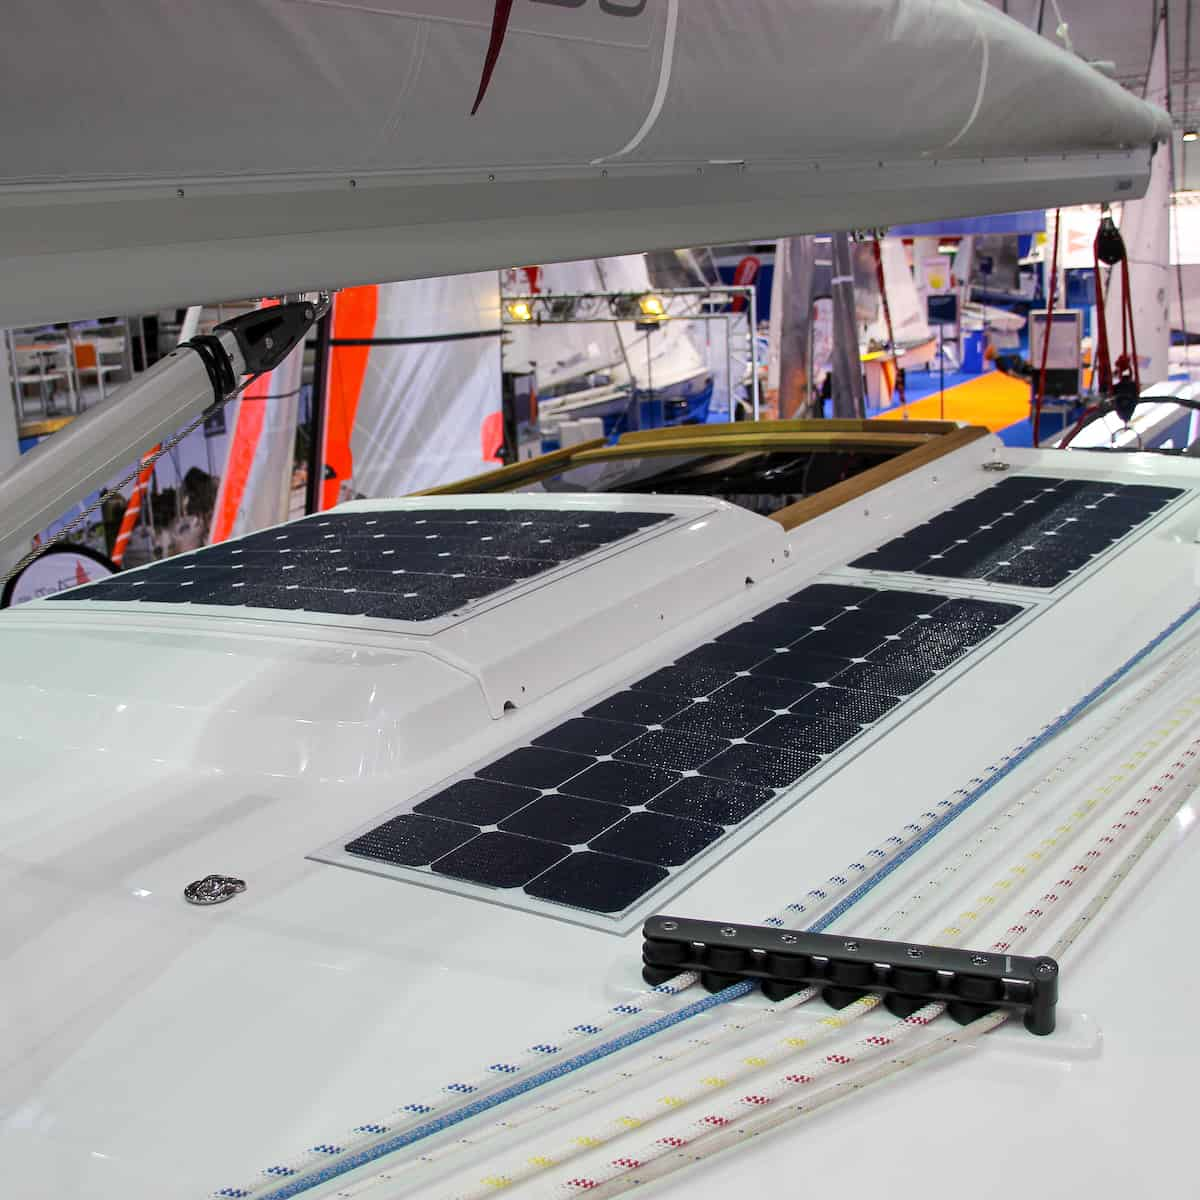 Sirius 40 DS 40DS Segelyacht Solbian Solar